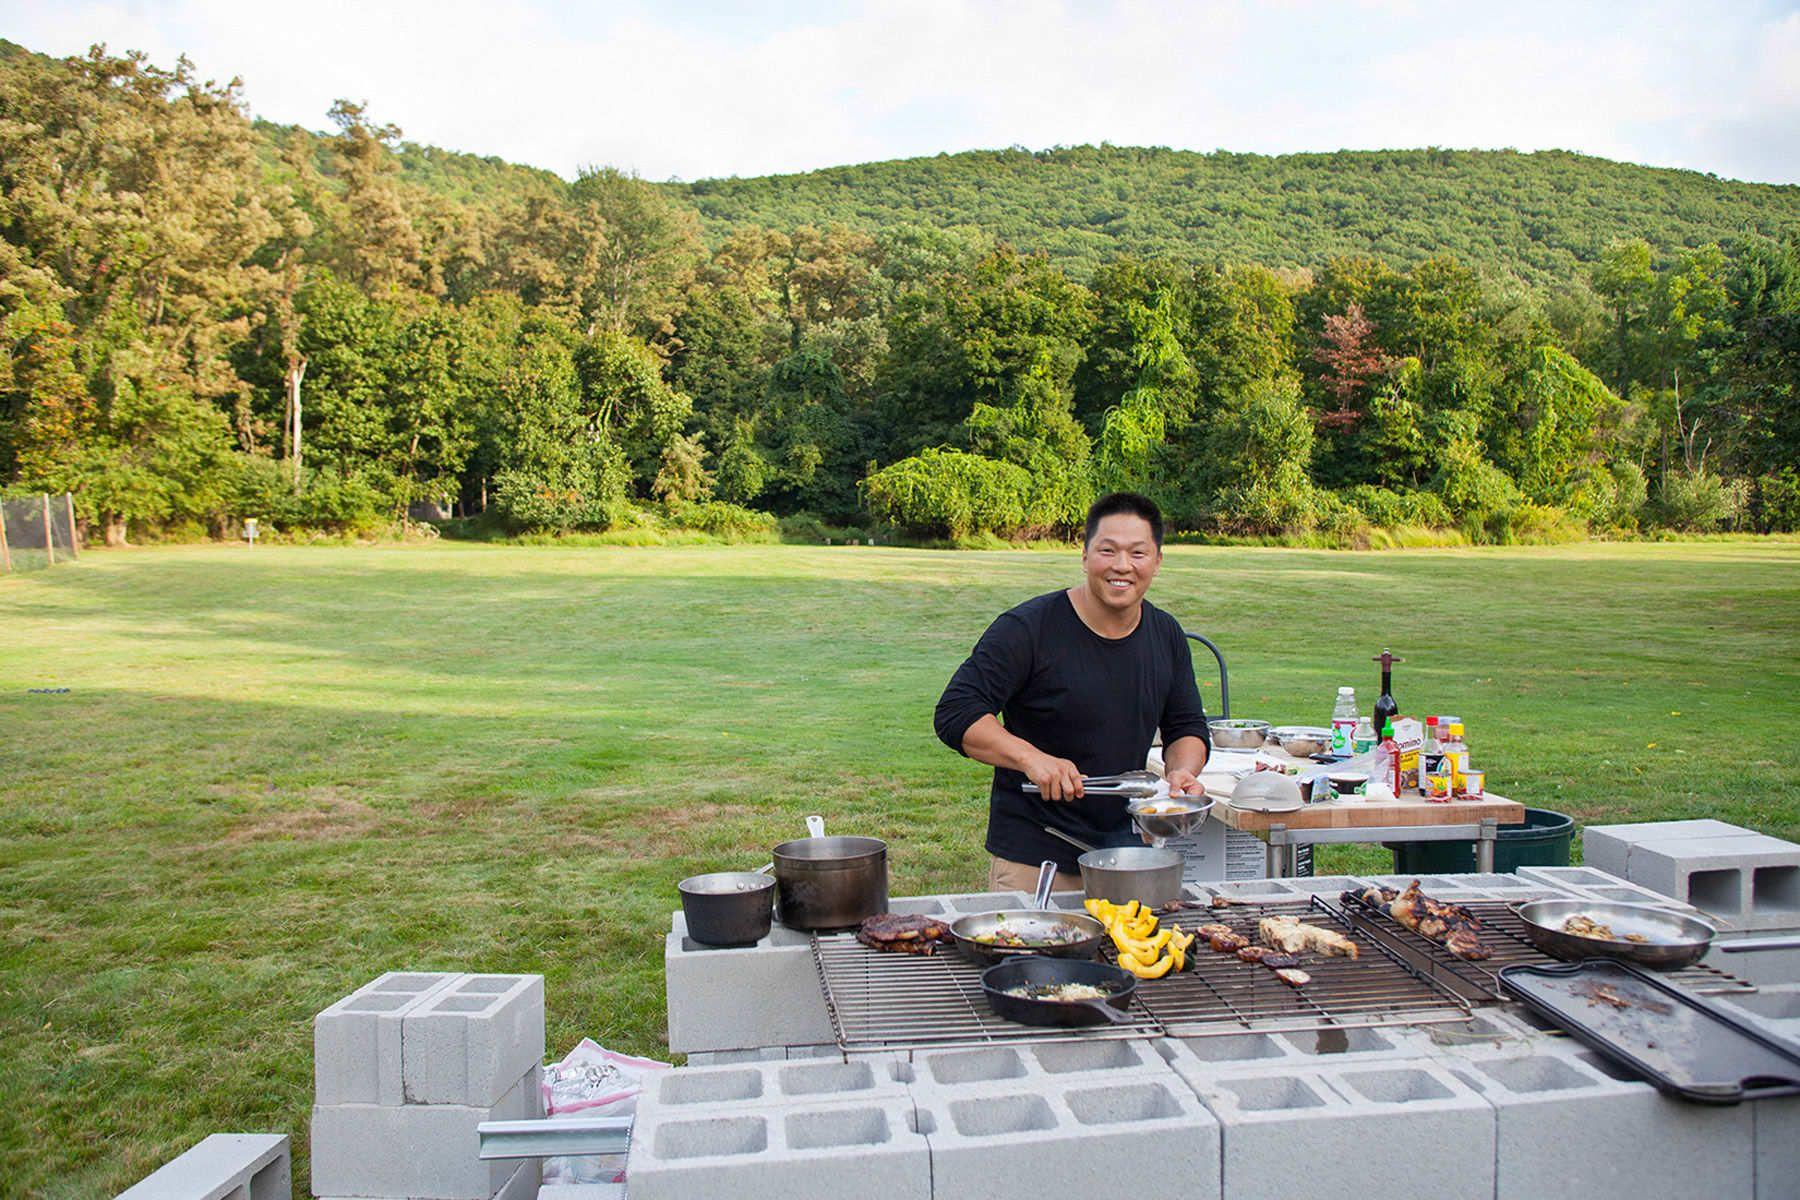 Dennis Lake:Chef, Entrepreneur